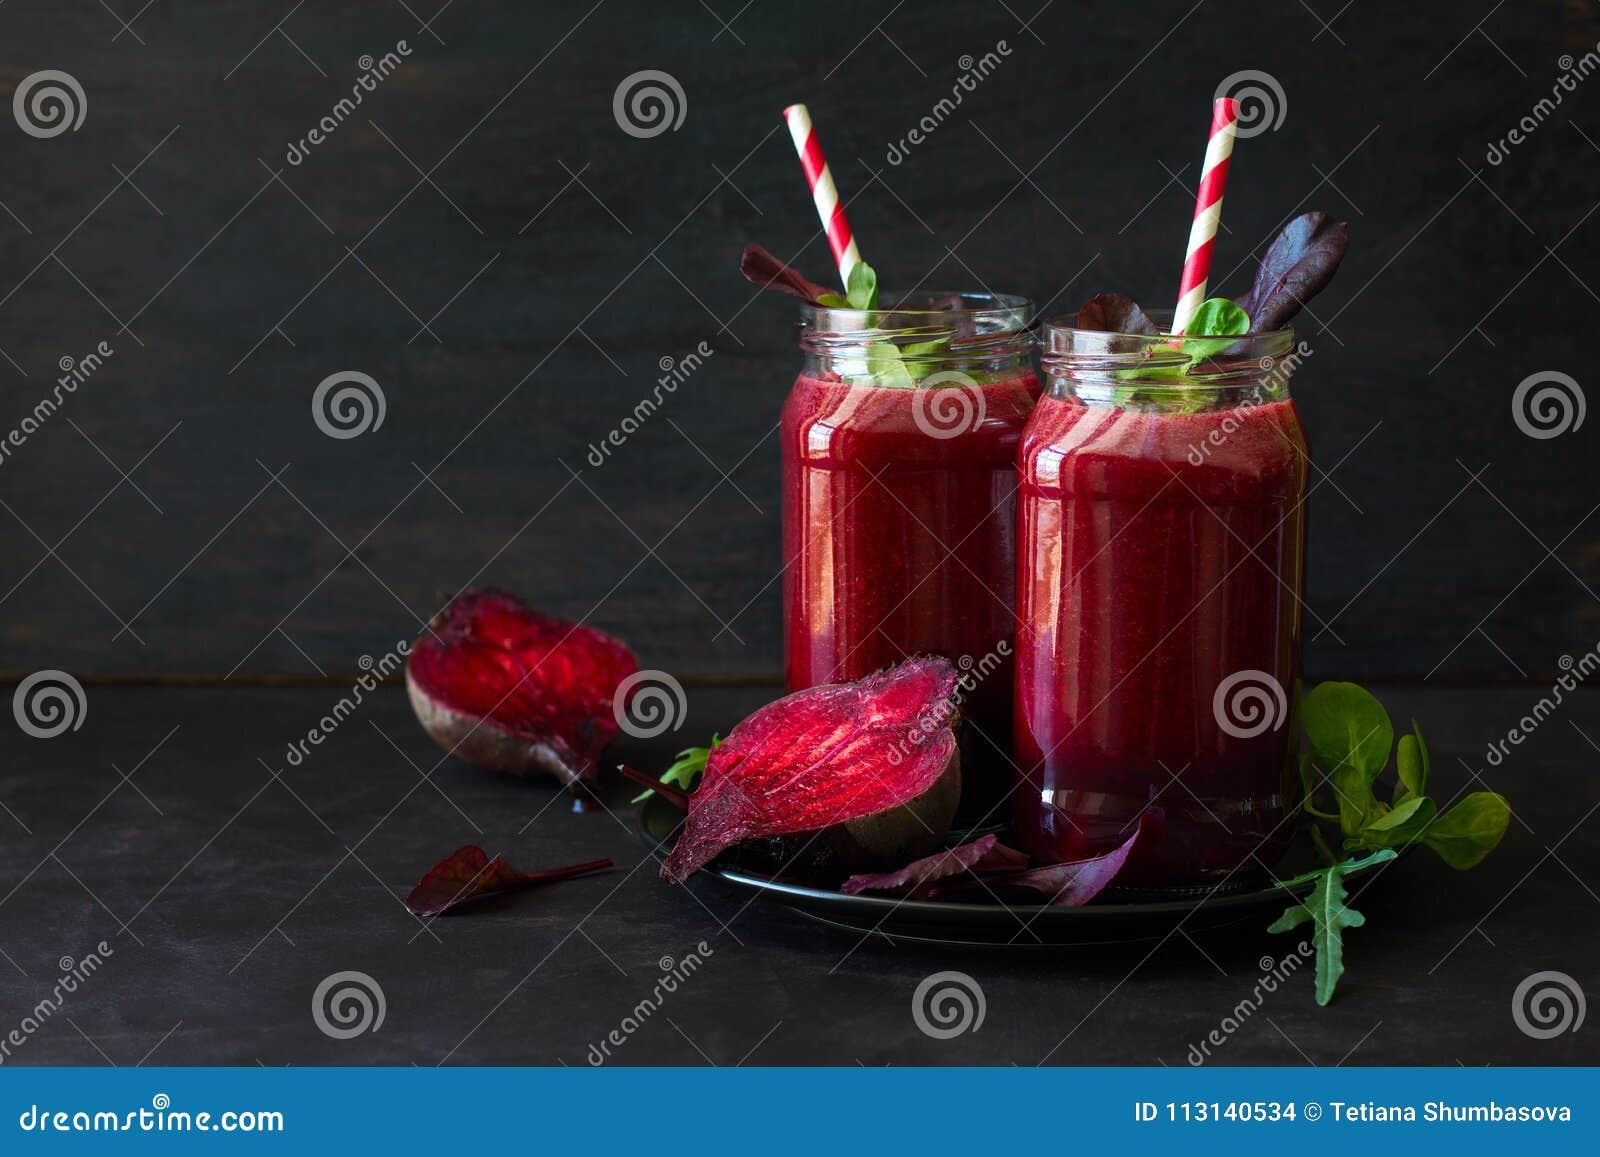 Fresh beetroot smoothie, beet, arugula and lettuce leaves